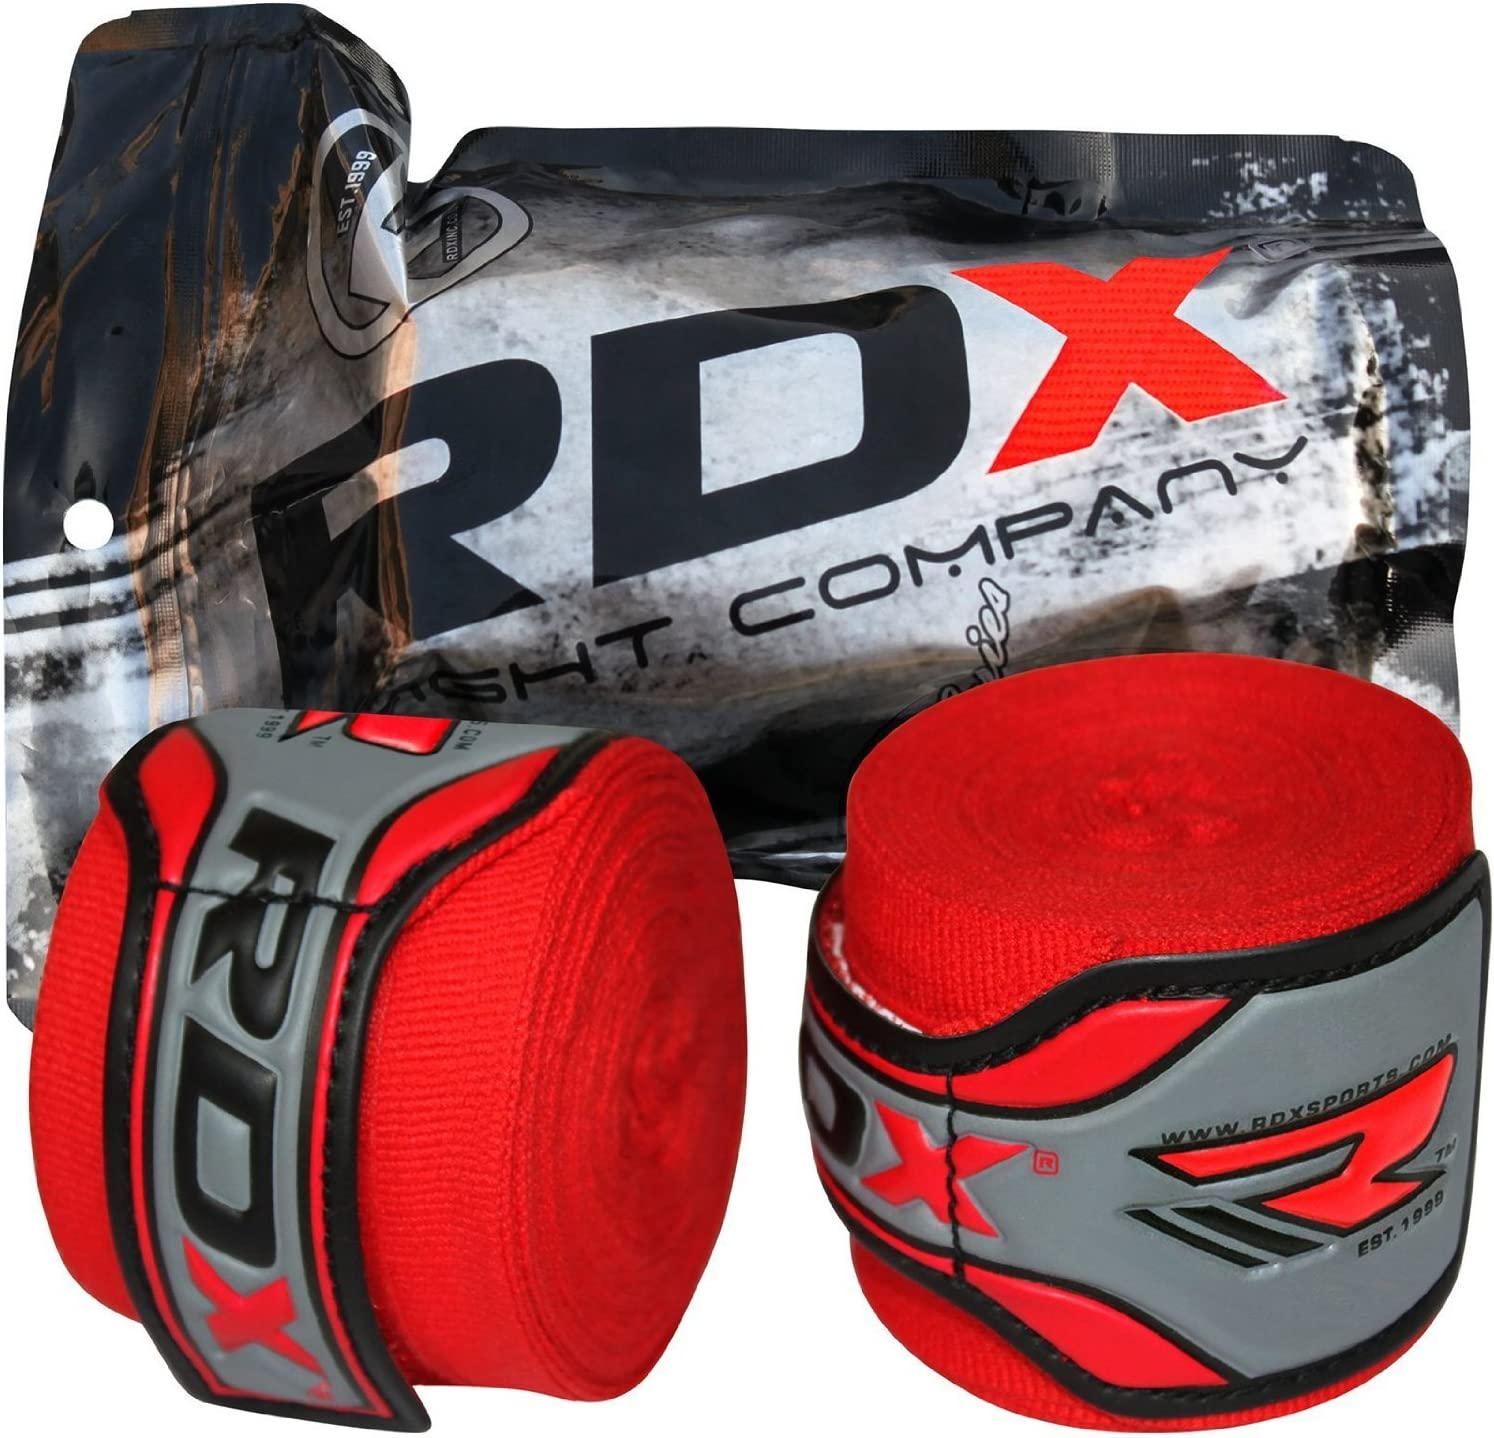 MEHRWEG RDX Boxen Boxbandagen Wraps MMA Elastisch Handschuhe Daumenschlaufe 4,5 Meter Innenhandschuhe Muay Thai